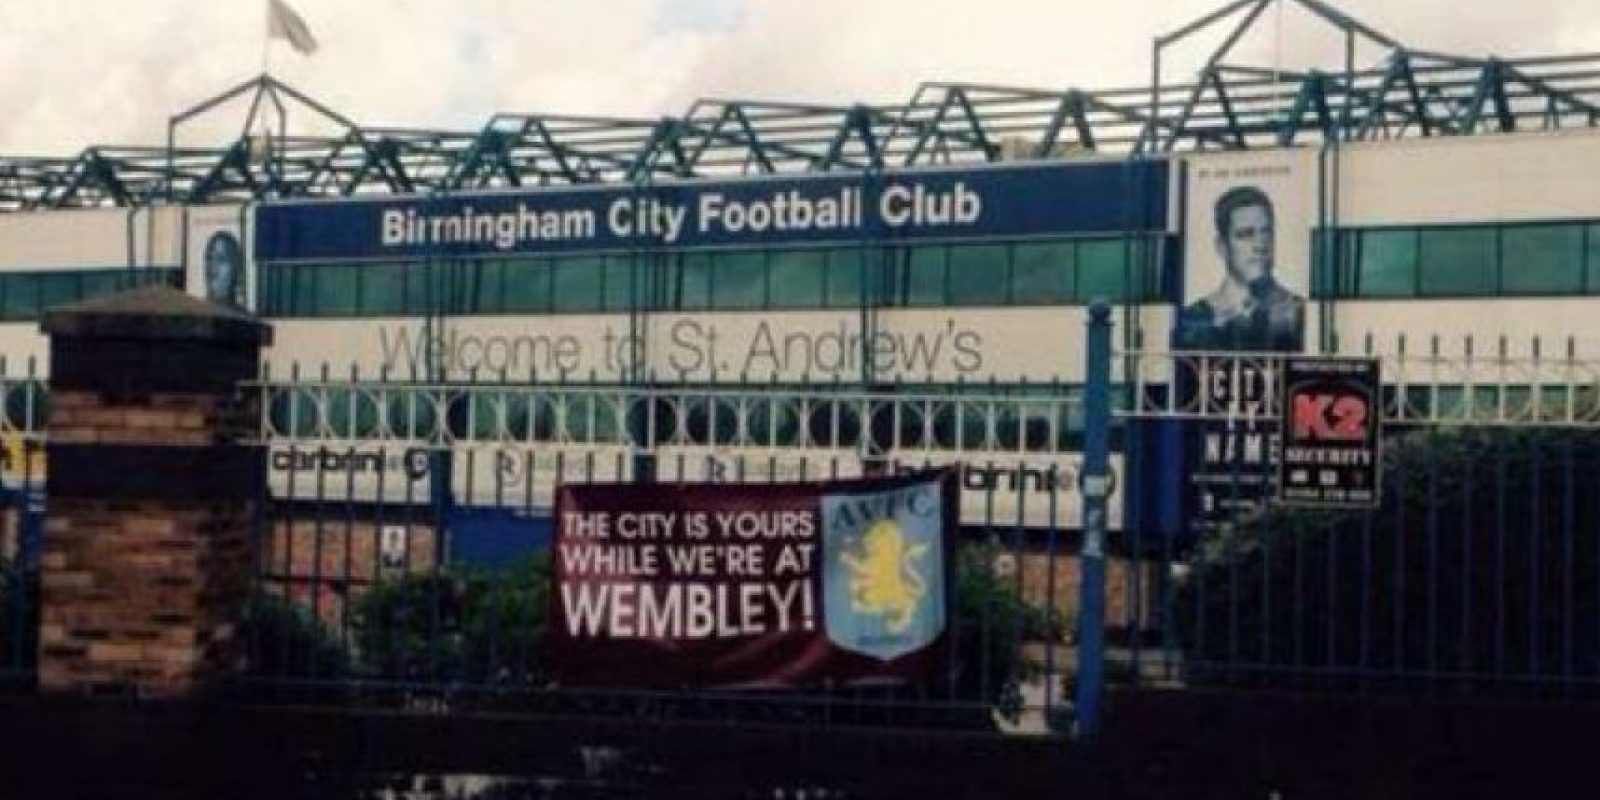 Aston Villa le dejó un mensajito al Birmingham City, su tradicional rival. Foto:Twitter.com/troll__football